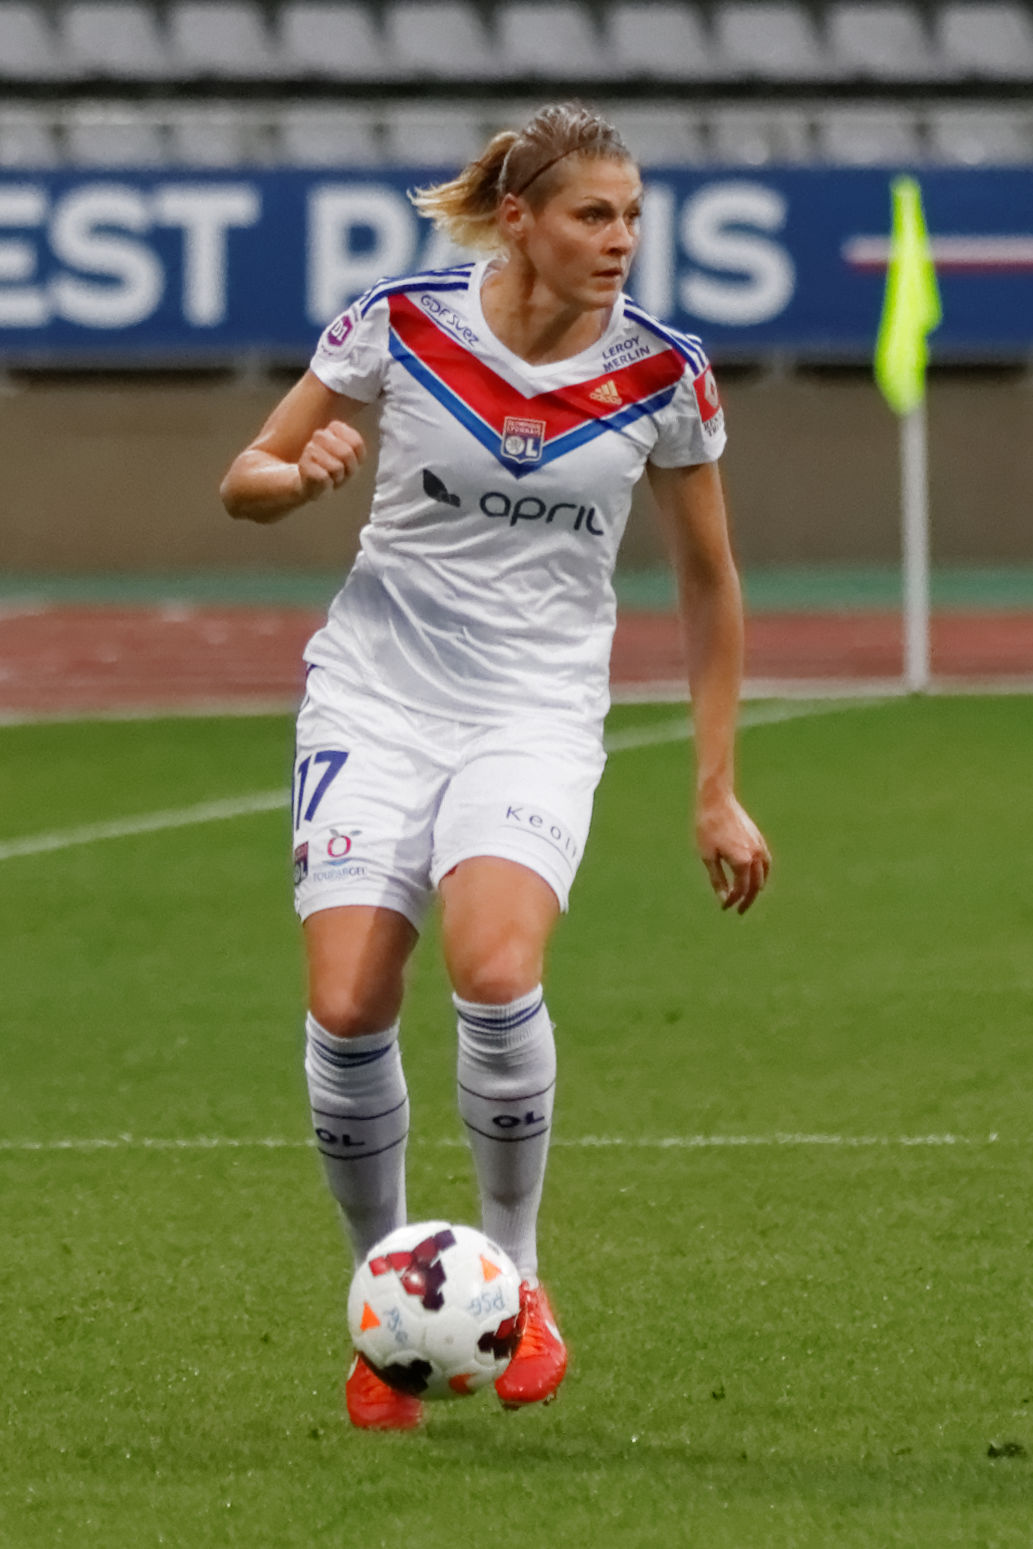 Photo of Corine Franco: Association football player